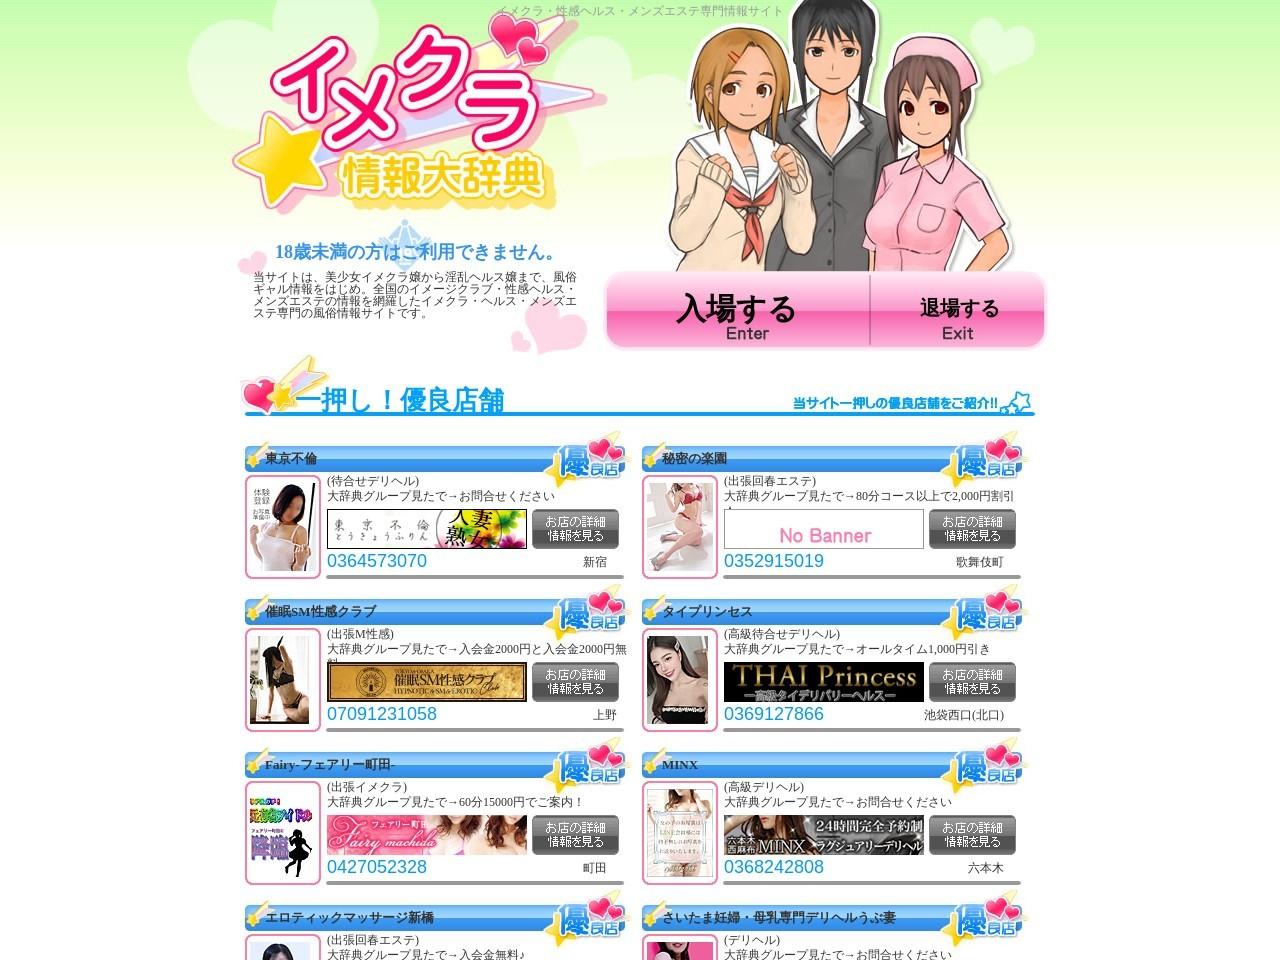 Hentai Video | 3D Anime Porn | Cartoon Clips | Hentai.video